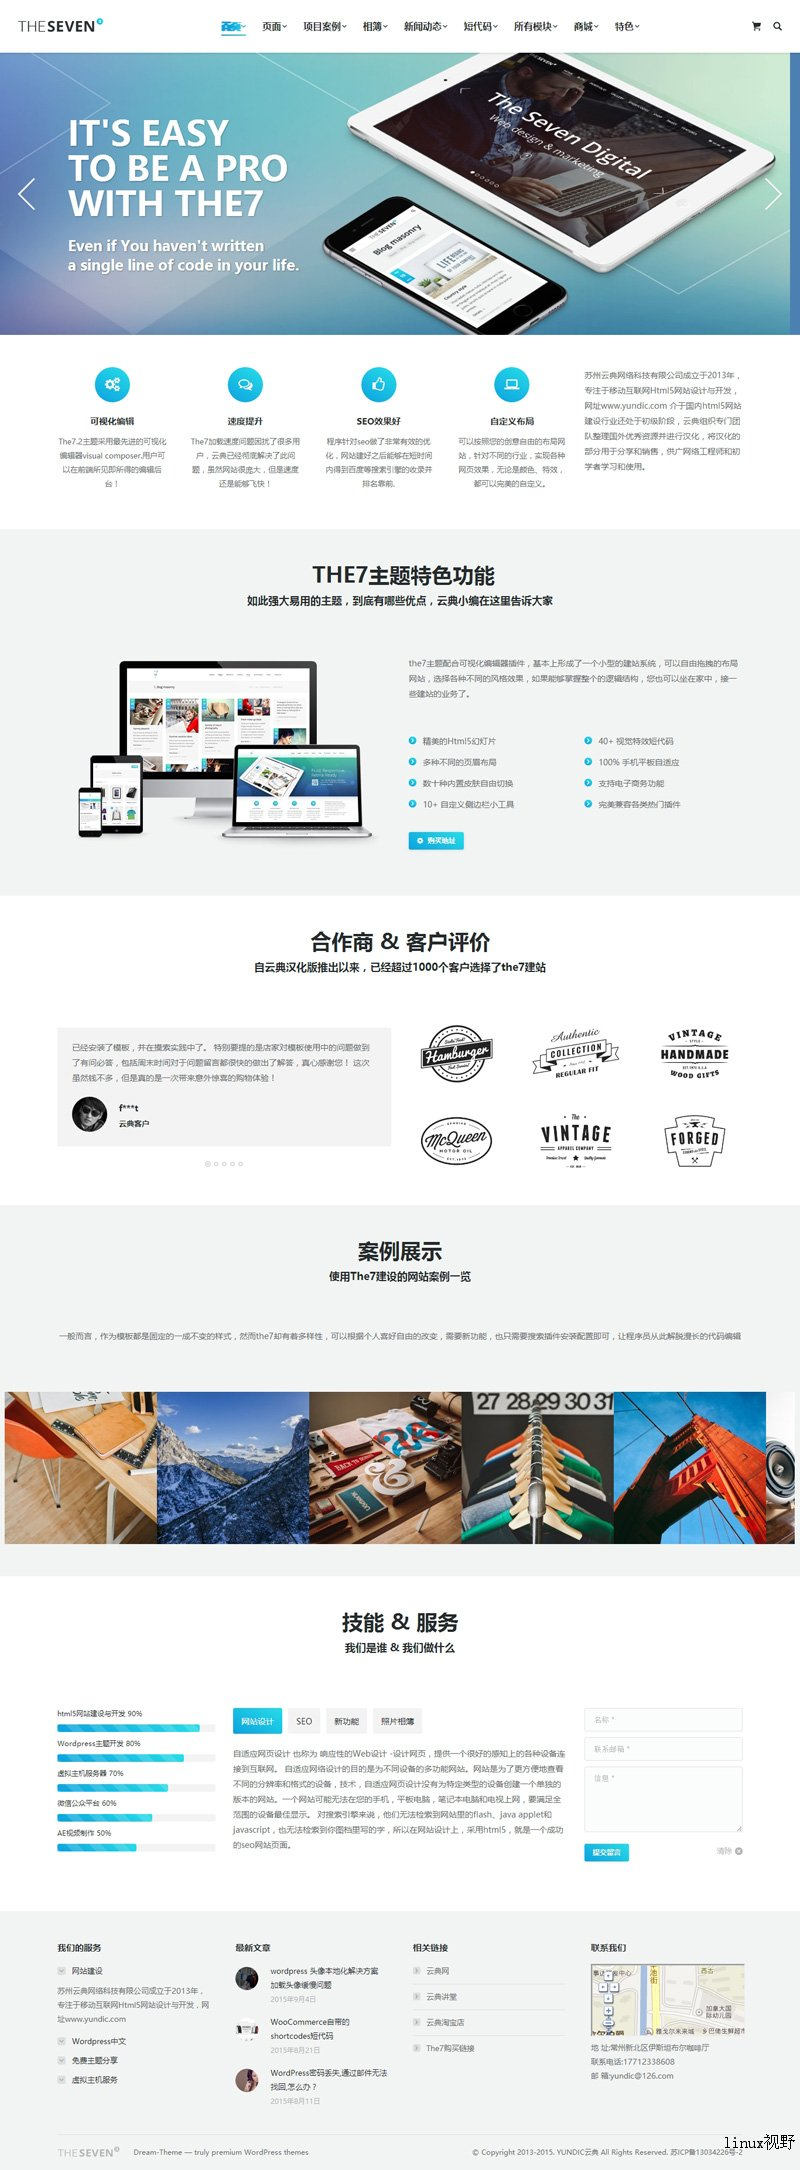 WordPress主题:html5响应式企业|商城汉化主题 The7.3-V3.7.0